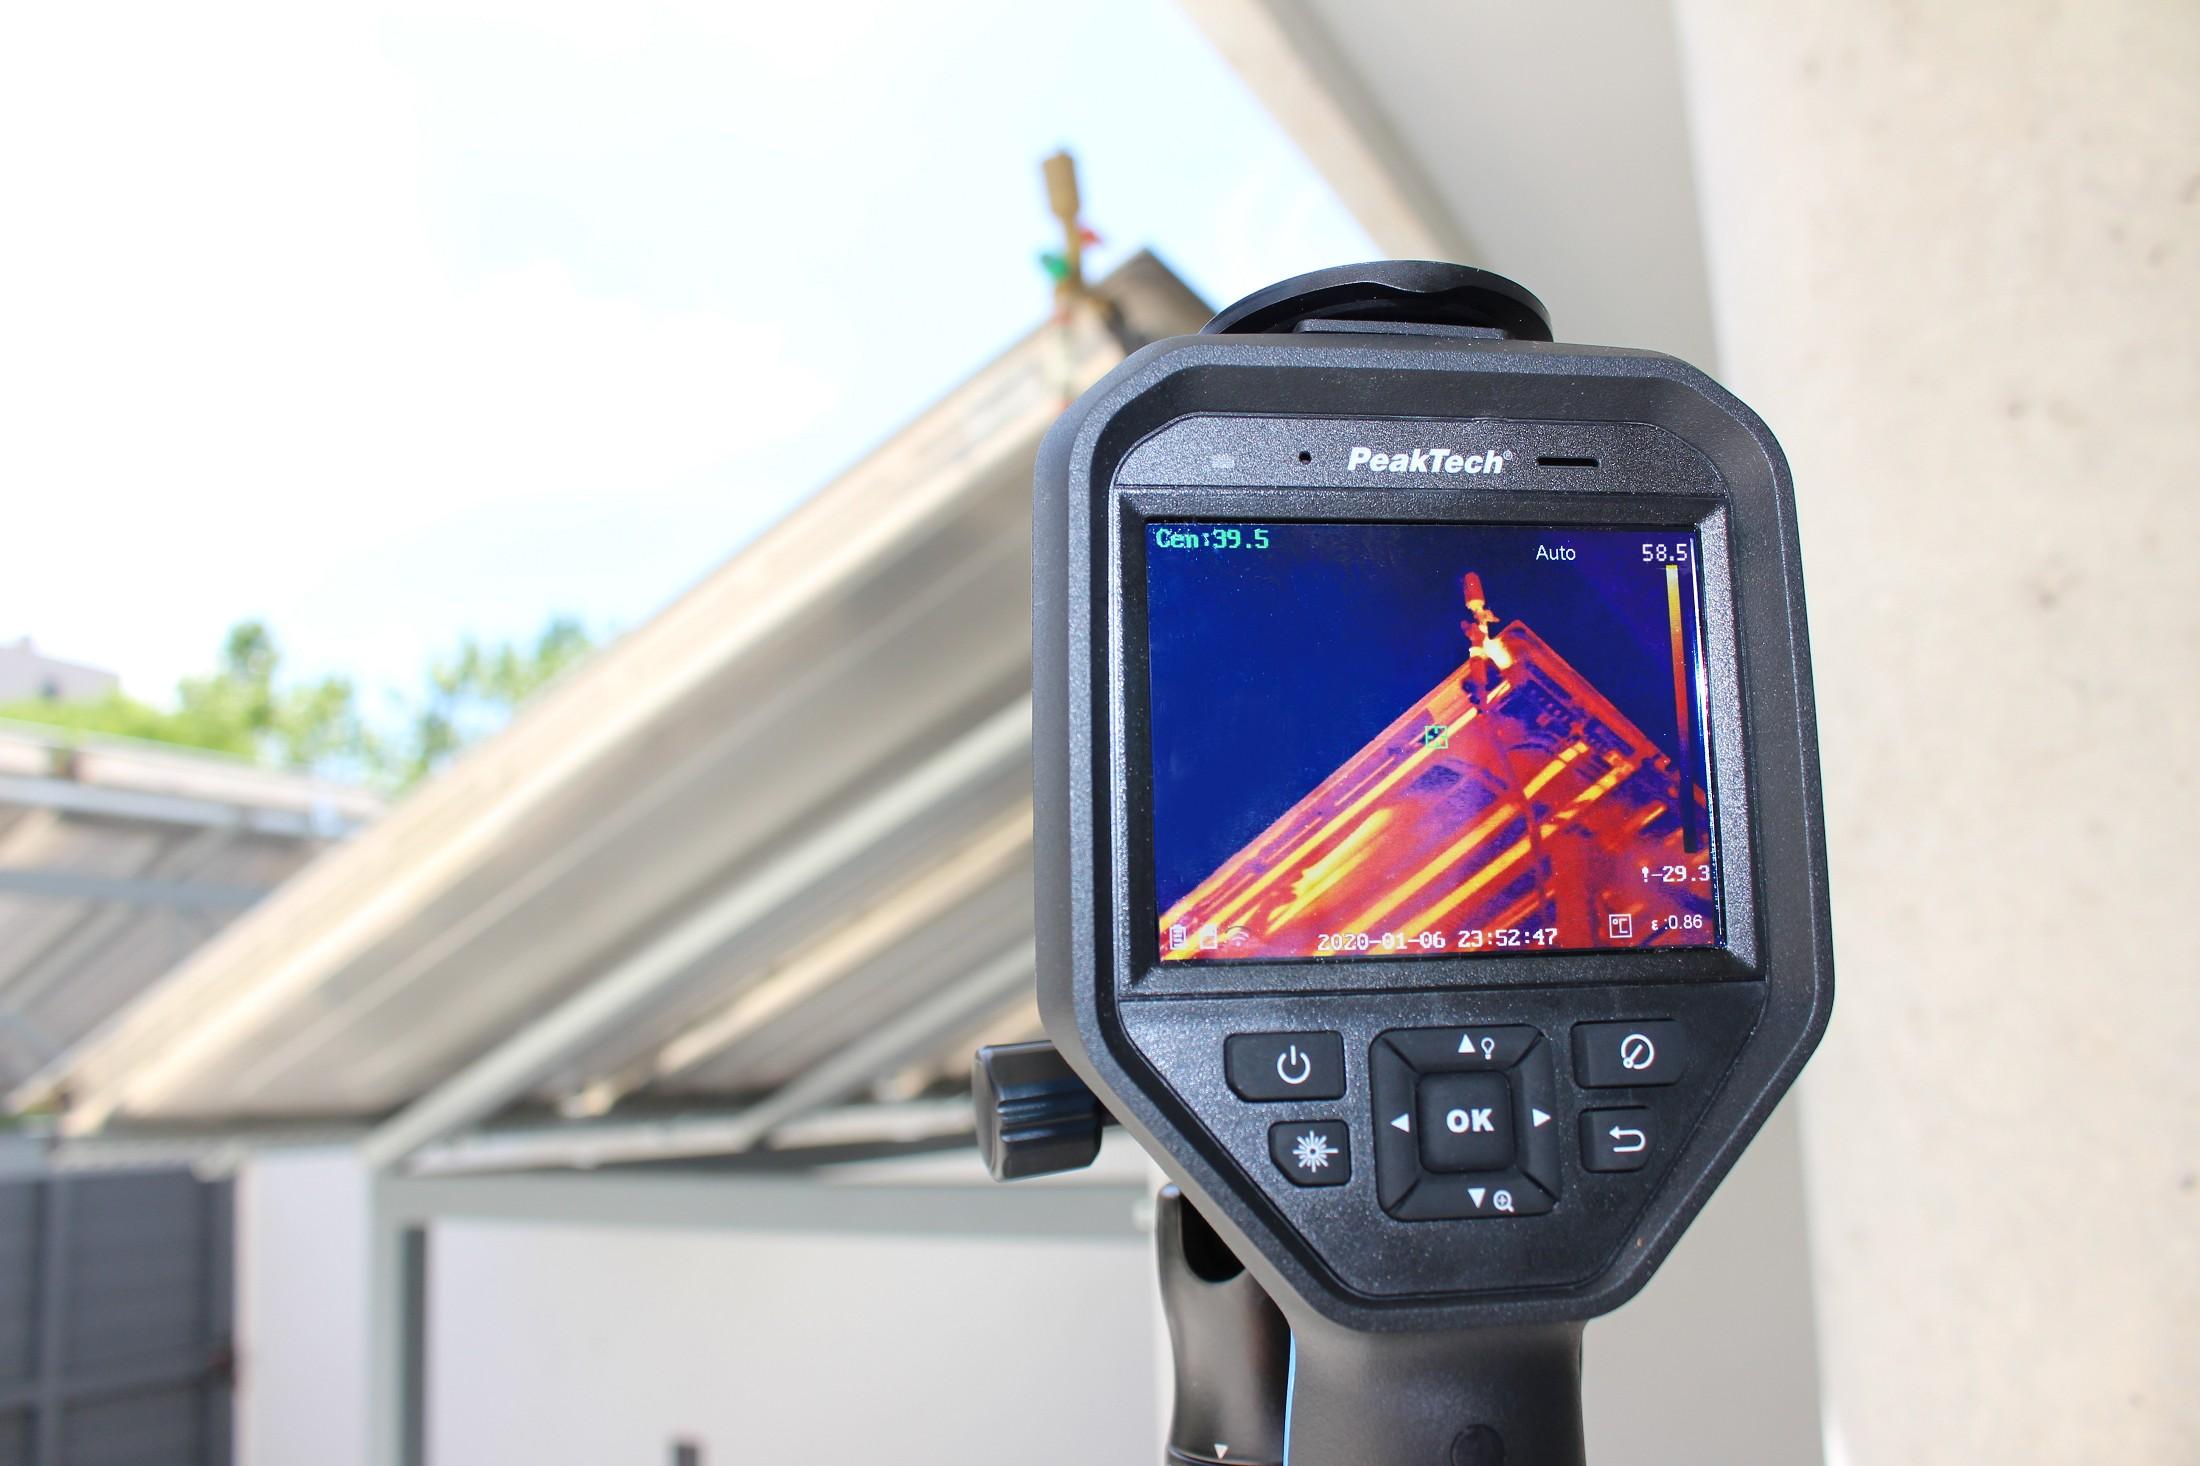 «PeakTech® P 5620» Thermal imaging camera 384x288 px. -20°C … 550°C